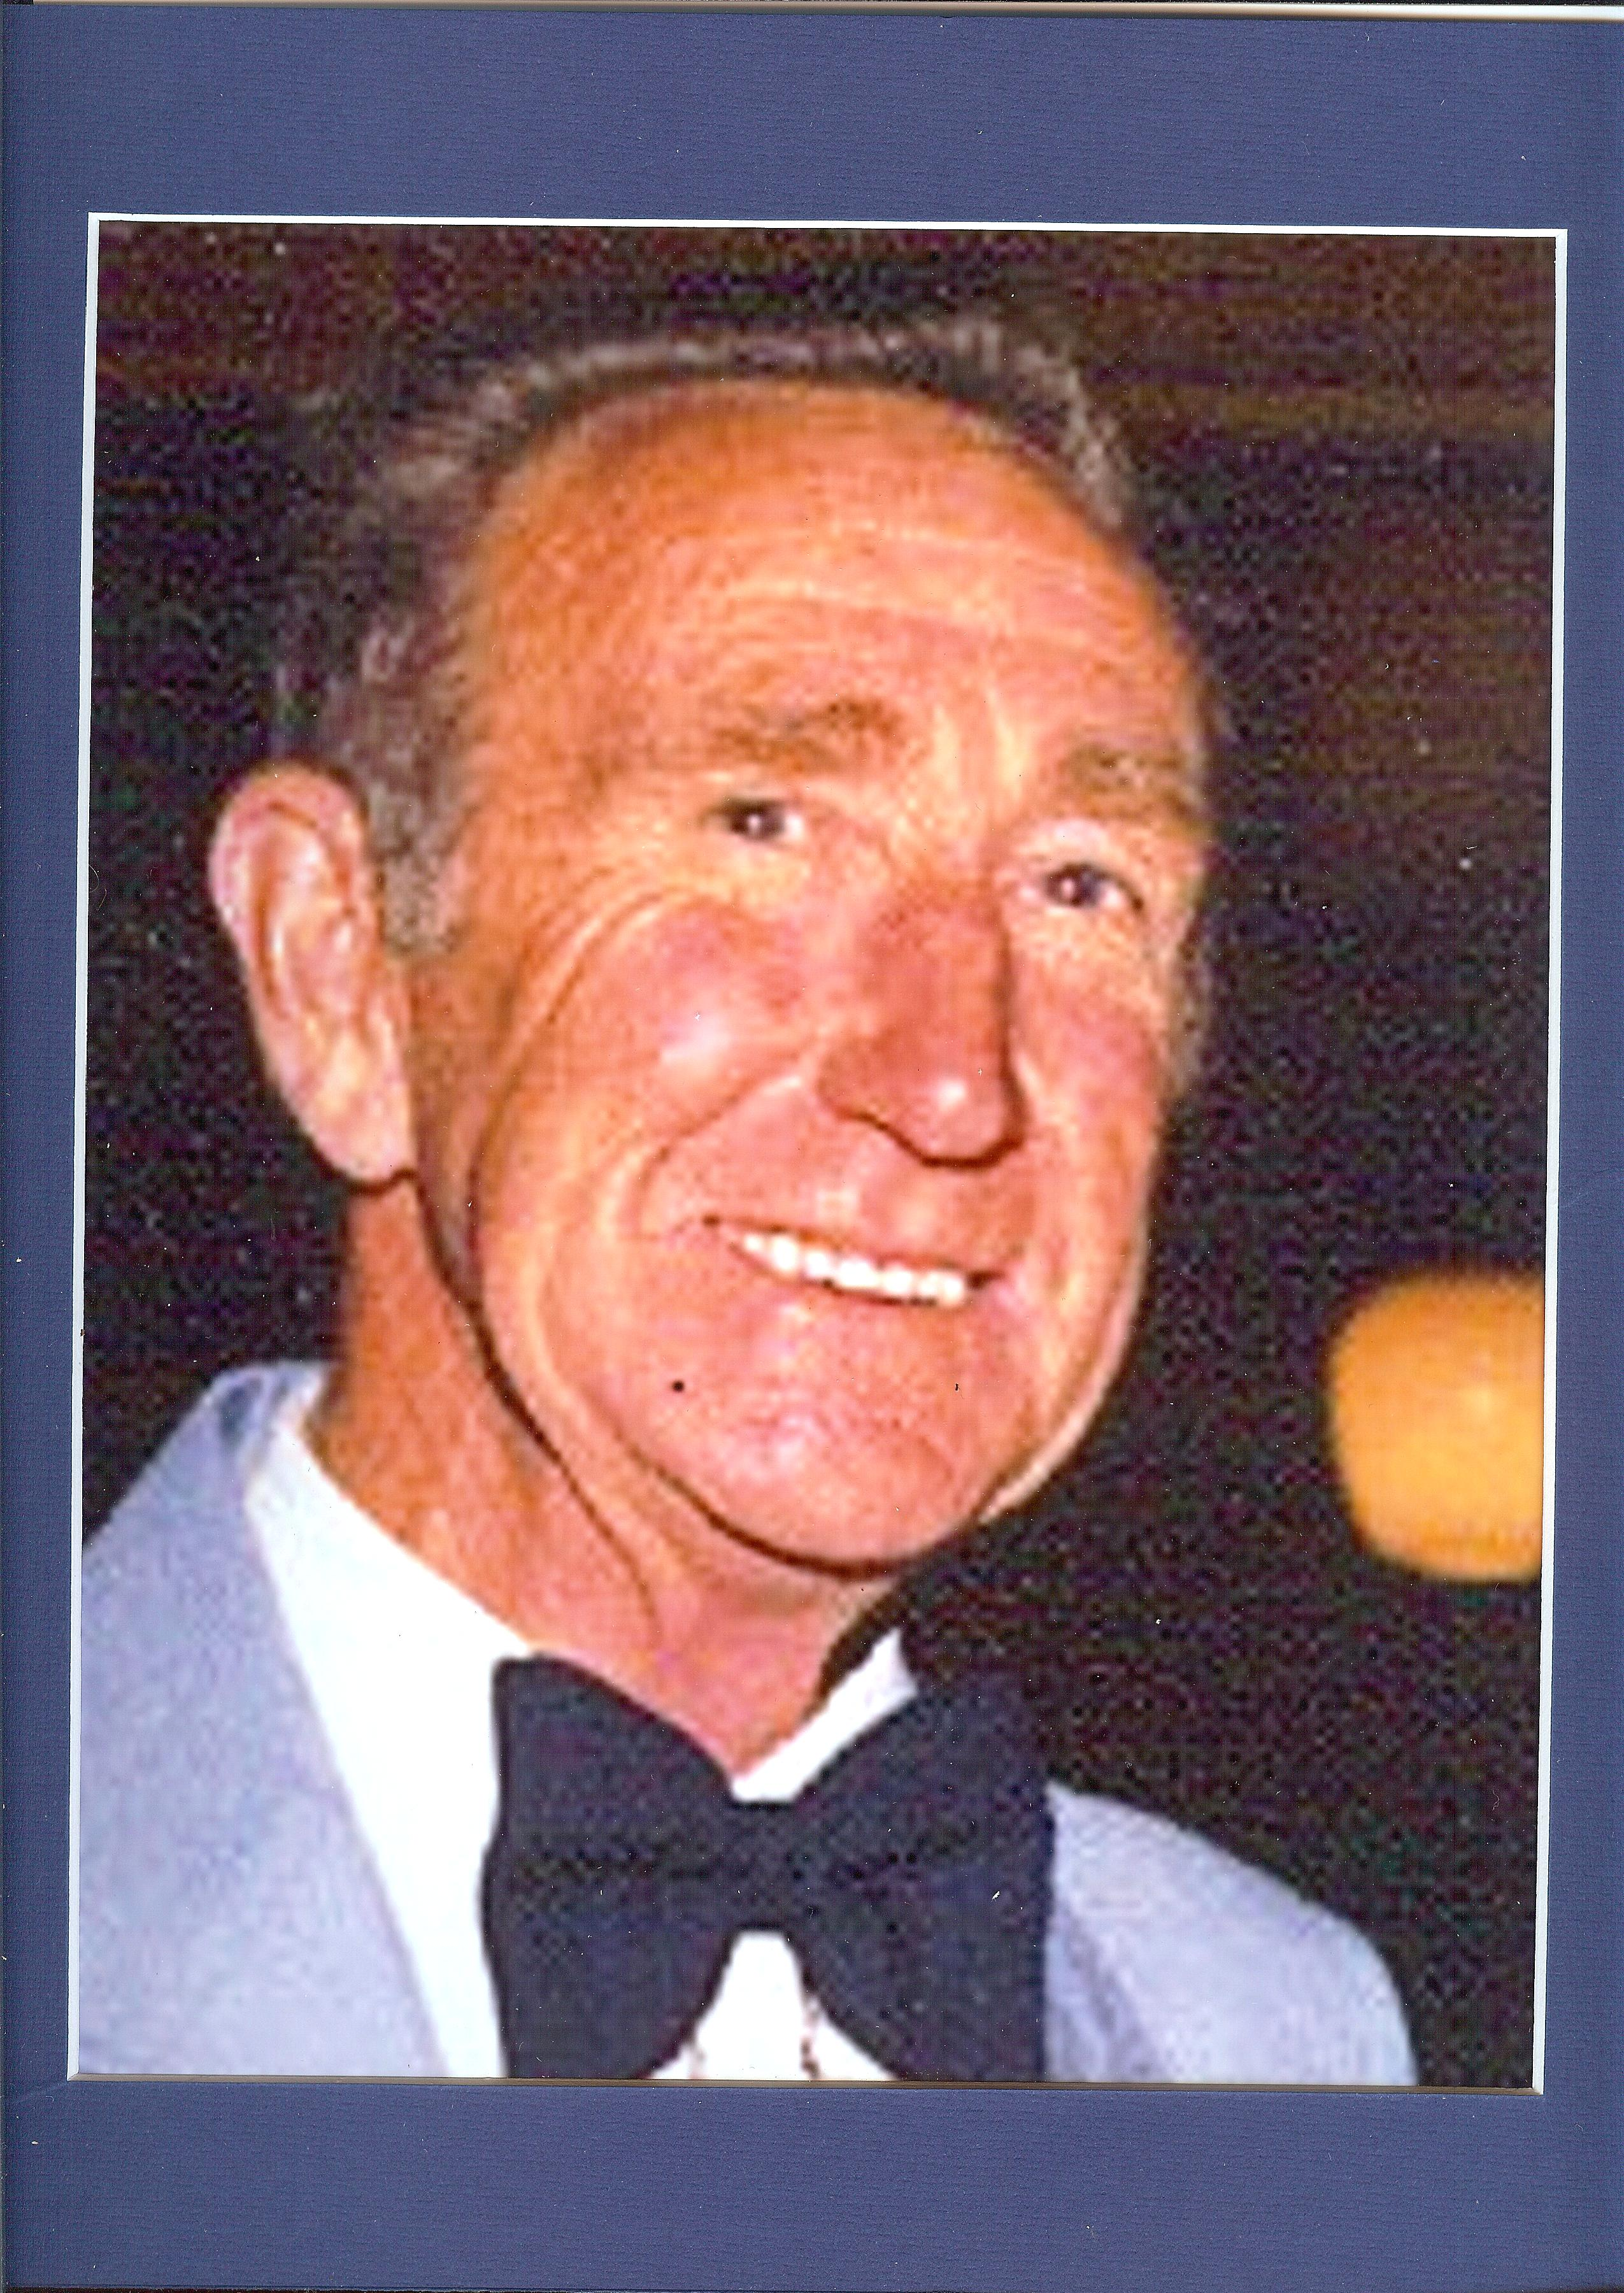 Life Member - Alan Bickford 001 - Life-Member-Alan-Bickford-001